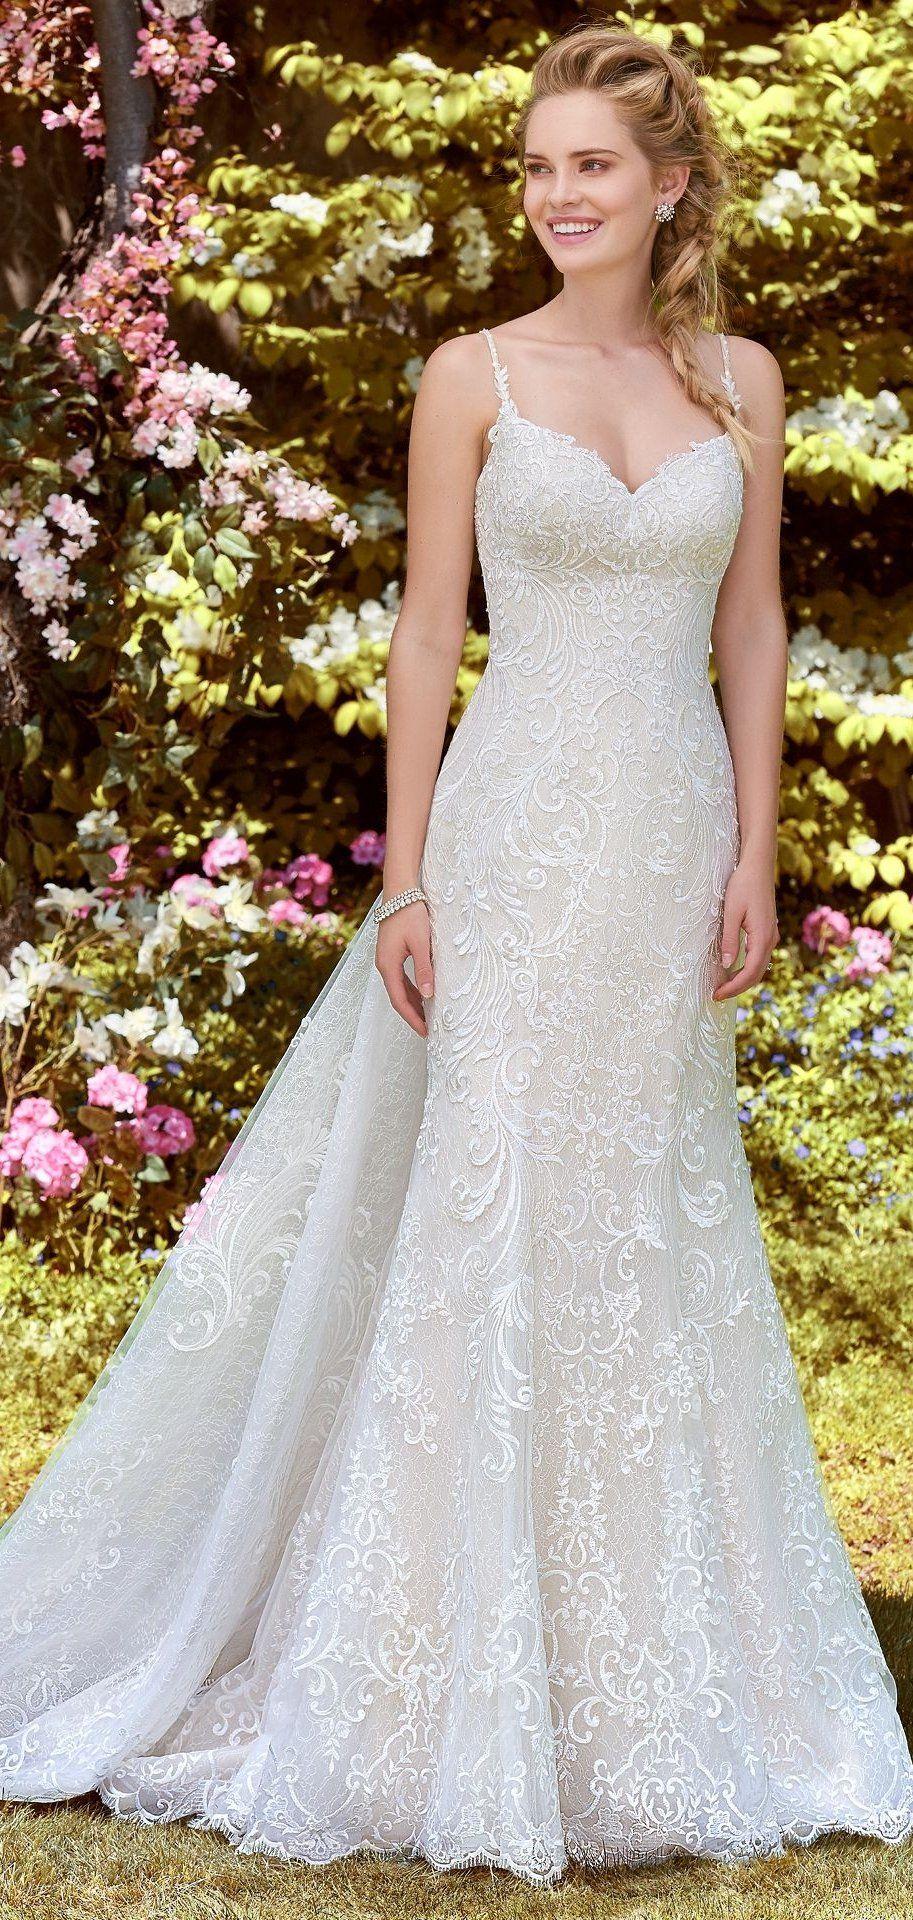 7961c5f6fda DEBBIE by Rebecca Ingram Wedding Dresses